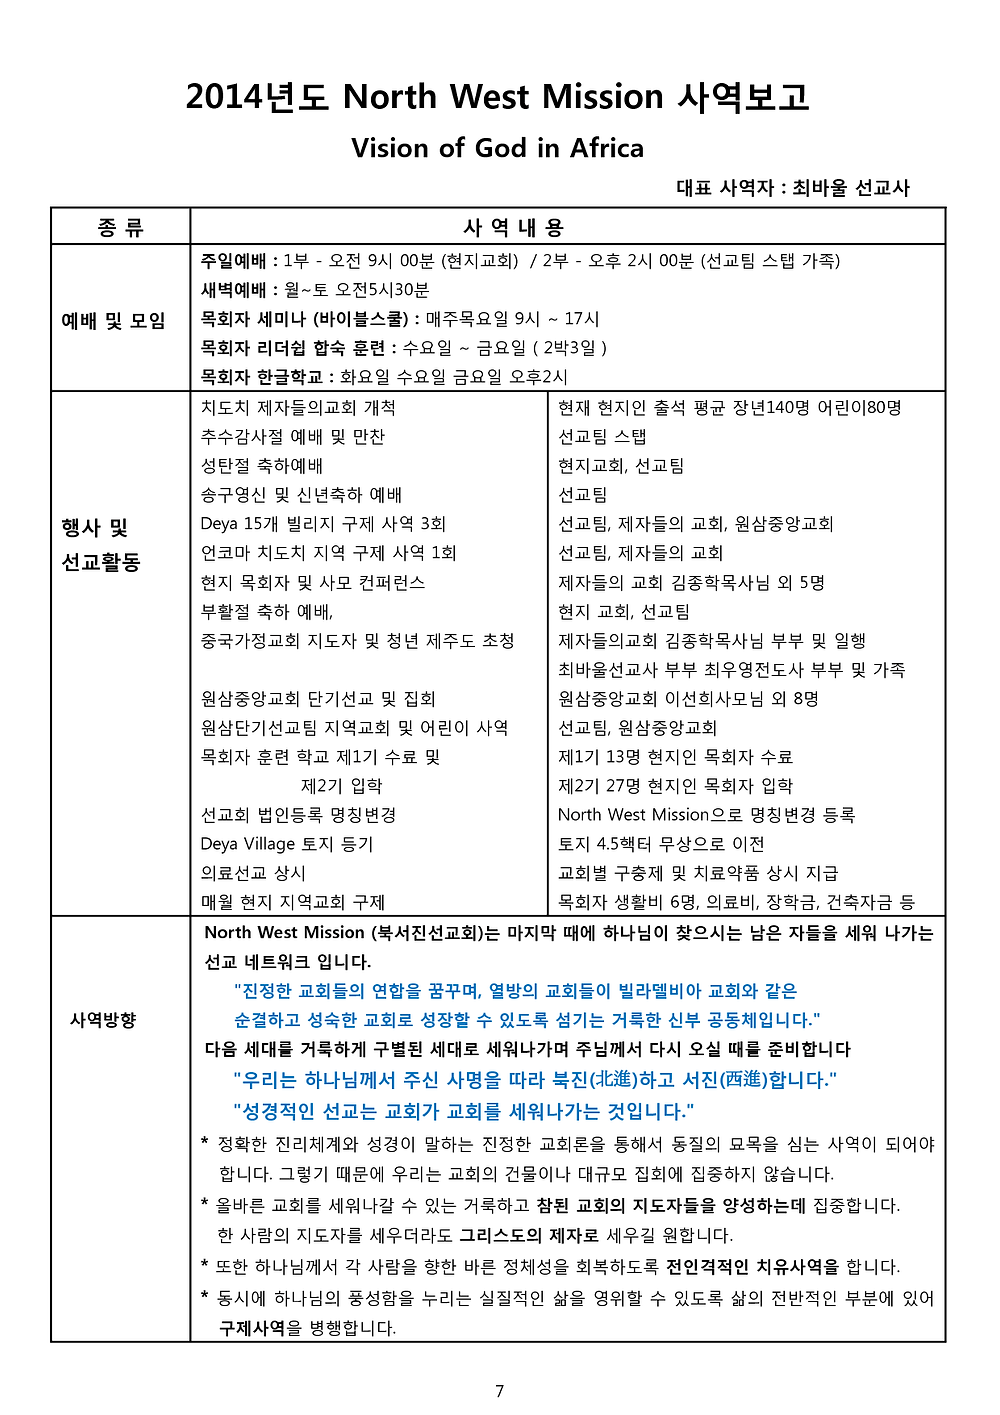 NWM 2014년 선교보고_7.png